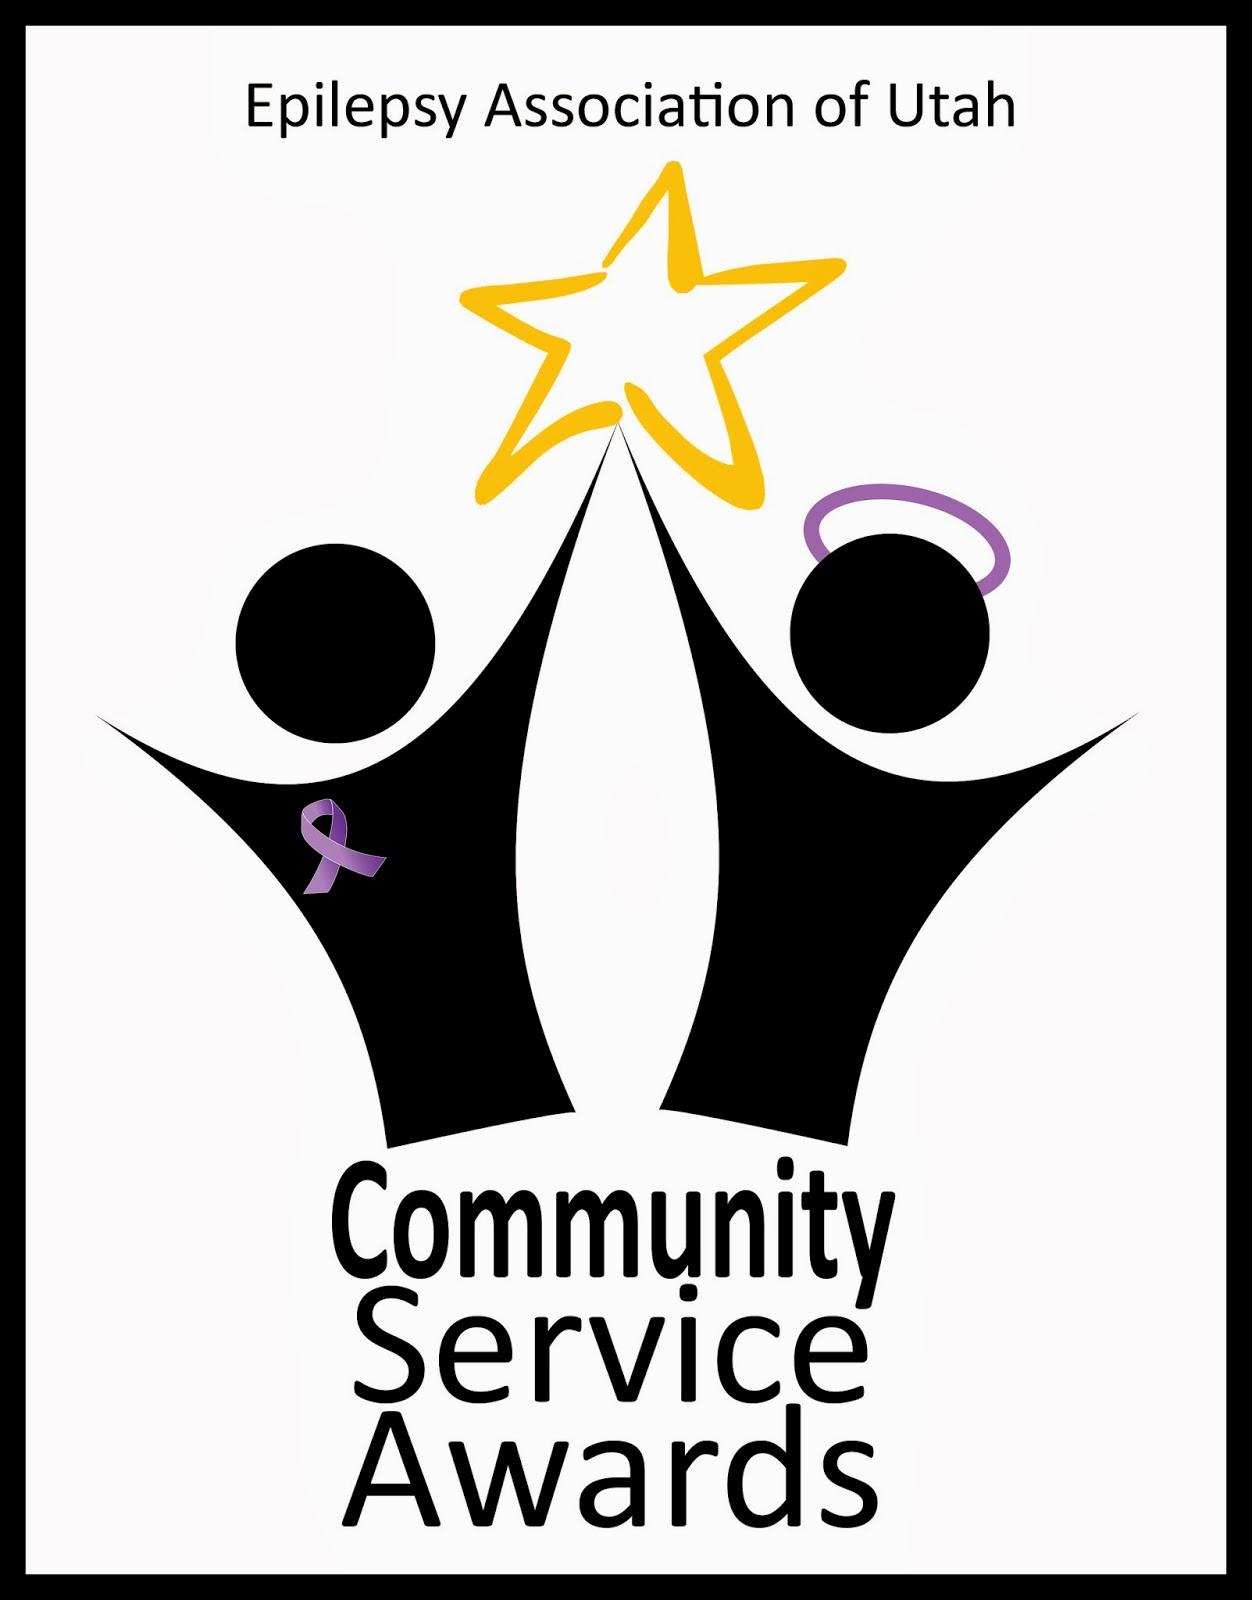 Epilepsyutah Community Service Award Winners